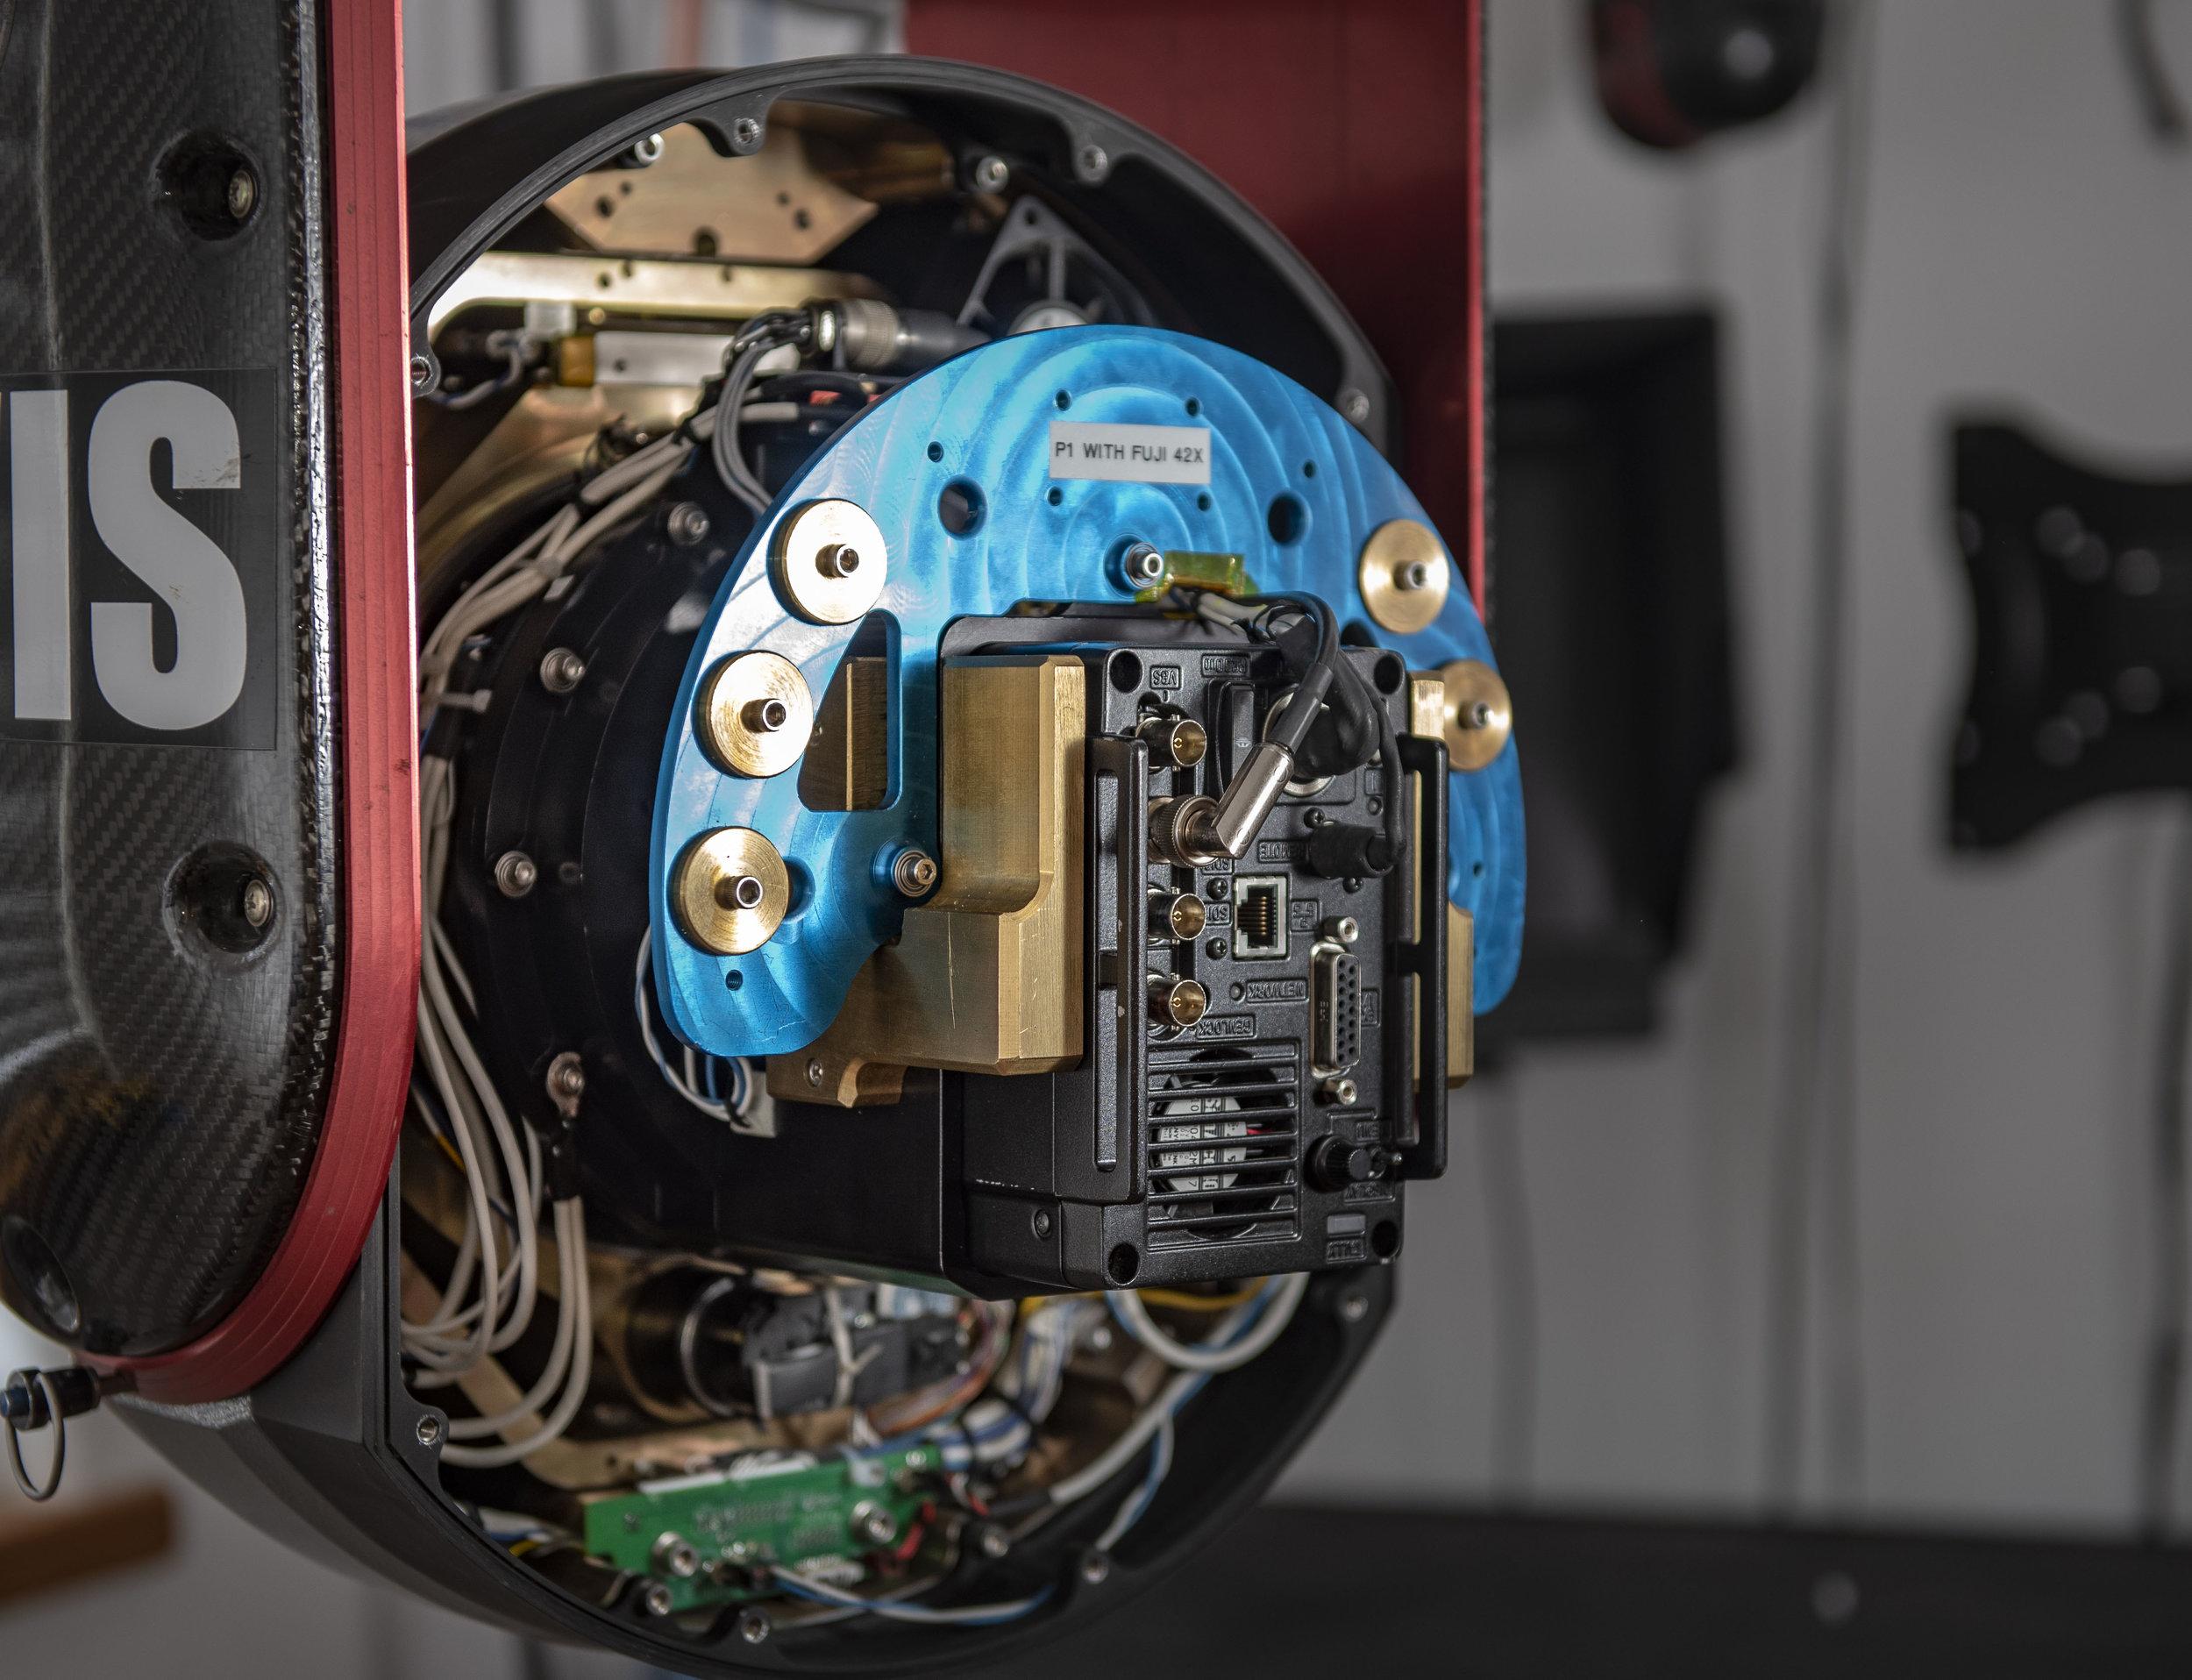 Cinefles Sony HDC P1 Upgrade.jpg